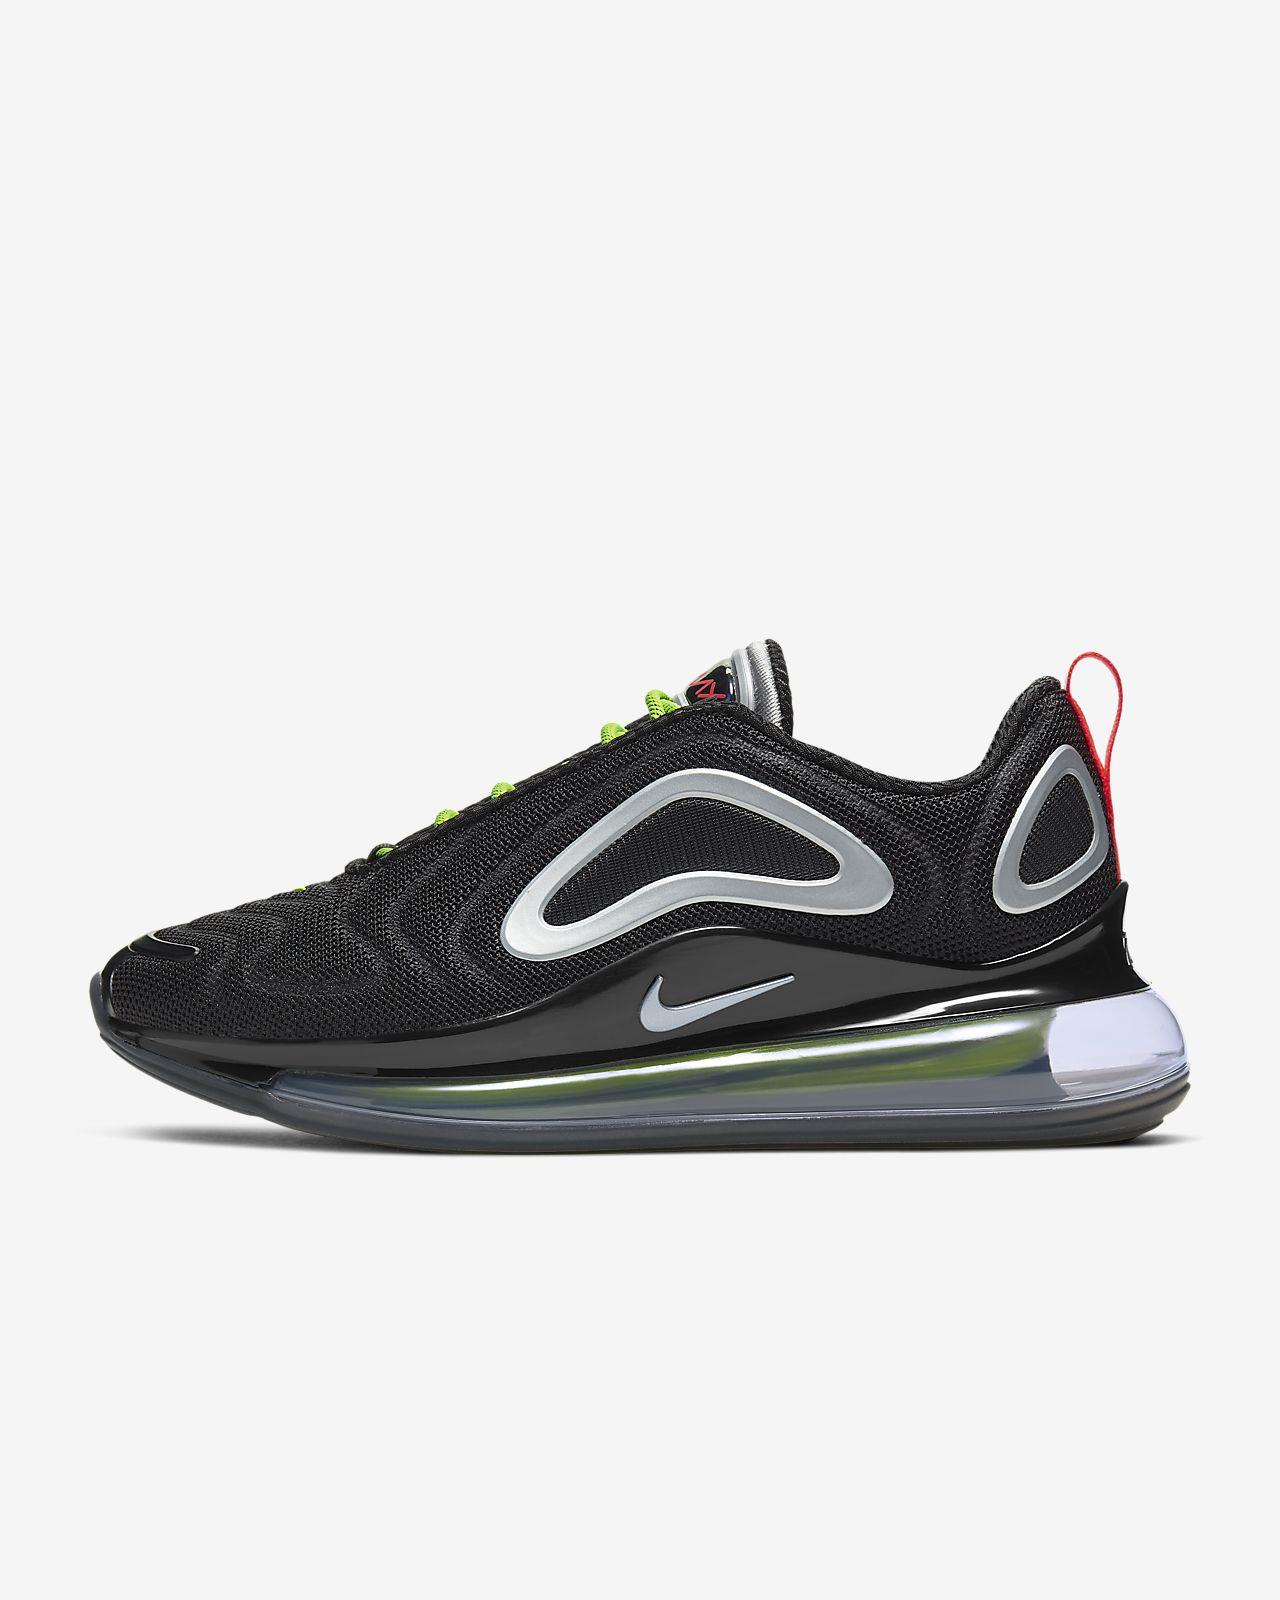 Kaufen Billig Sparen 61% Rabatt Nike Nike air max tailwind 6